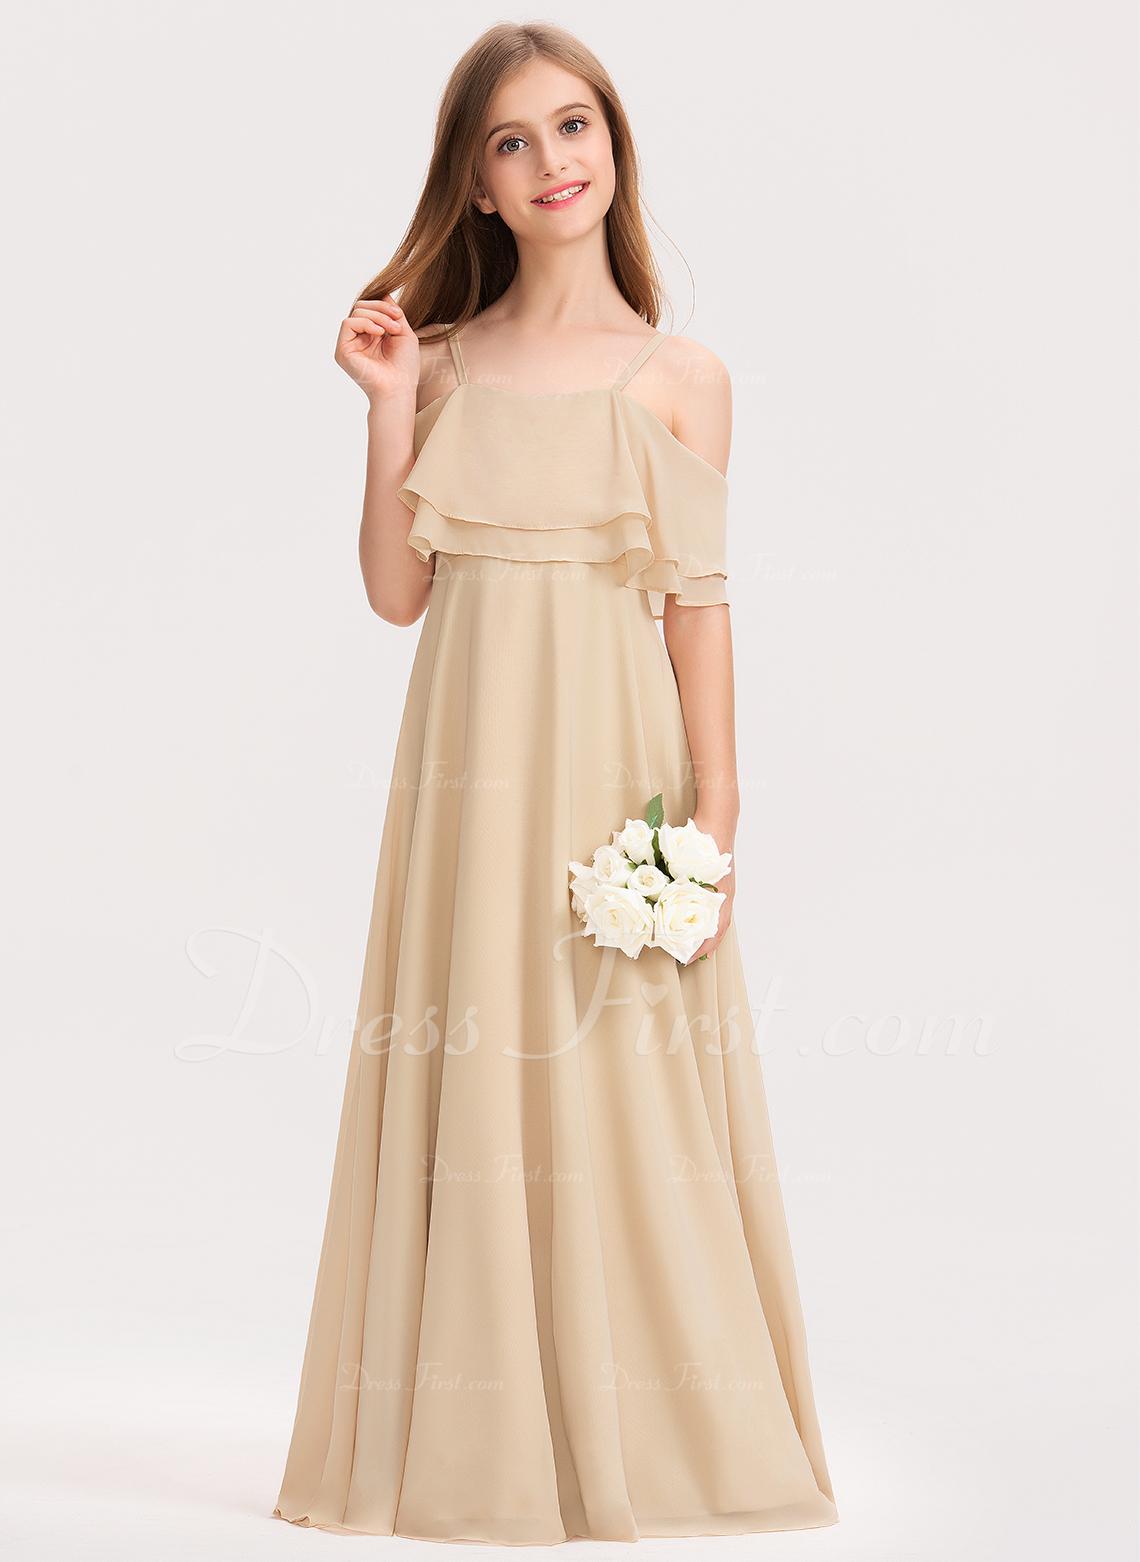 A-Line Off-the-Shoulder Floor-Length Chiffon Junior Bridesmaid Dress With Cascading Ruffles